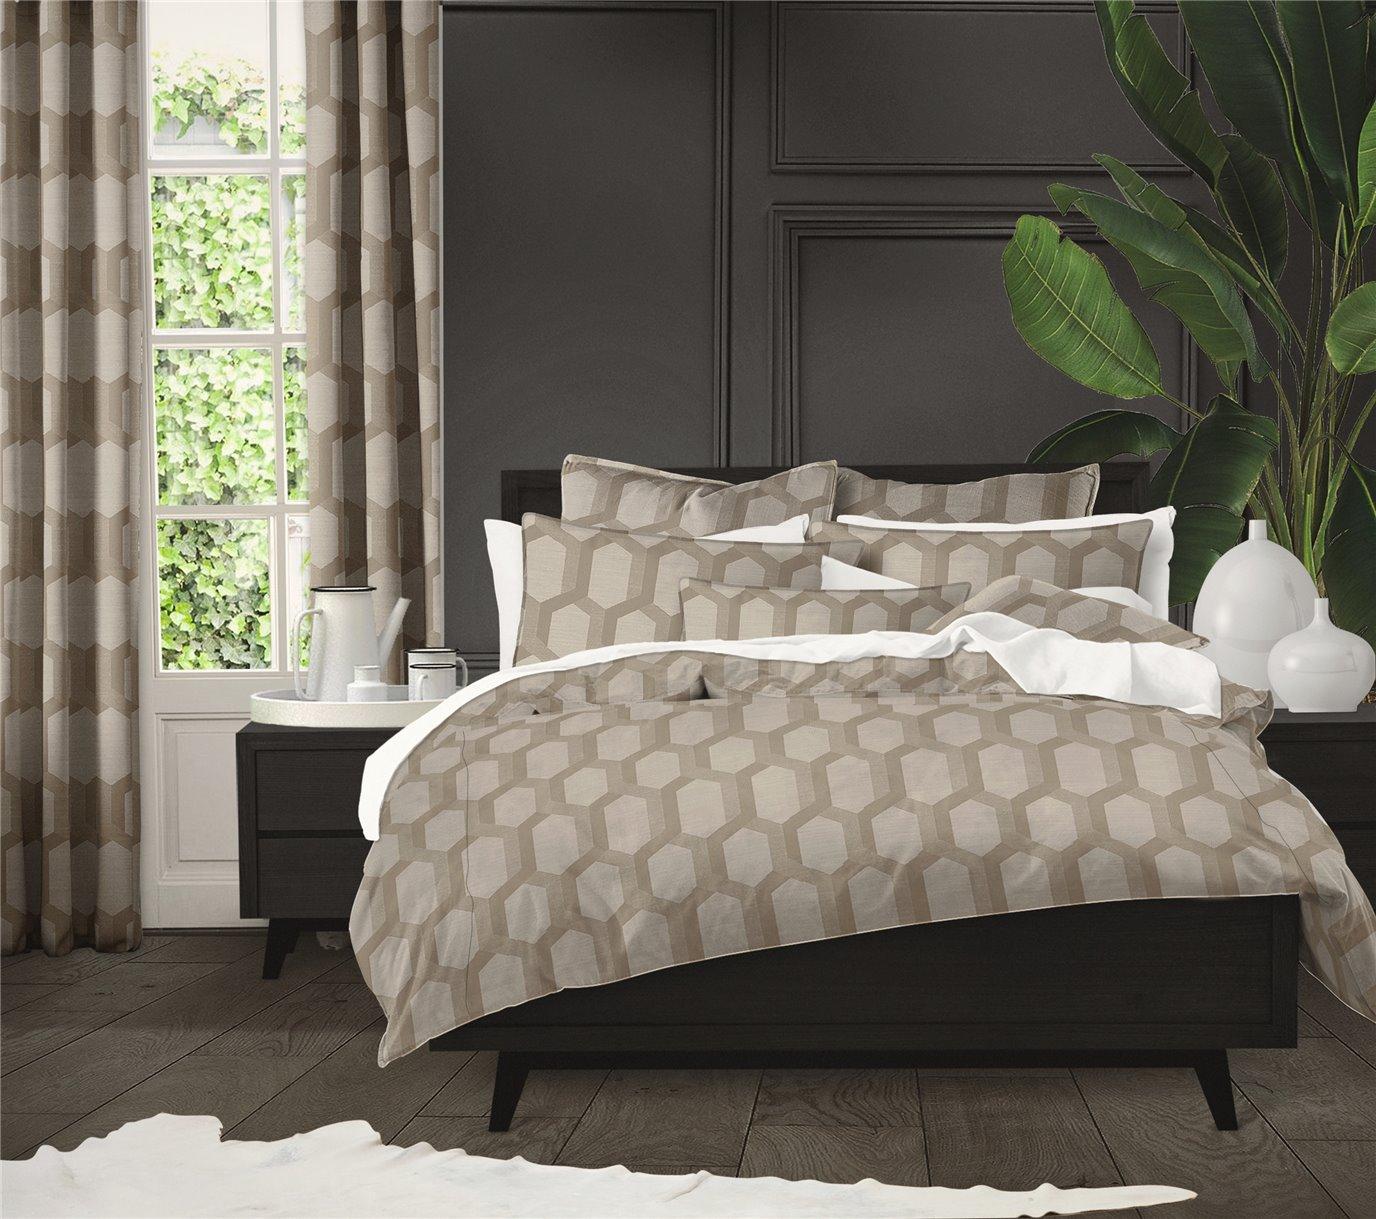 Maidstone Taupe Comforter Set - Twin